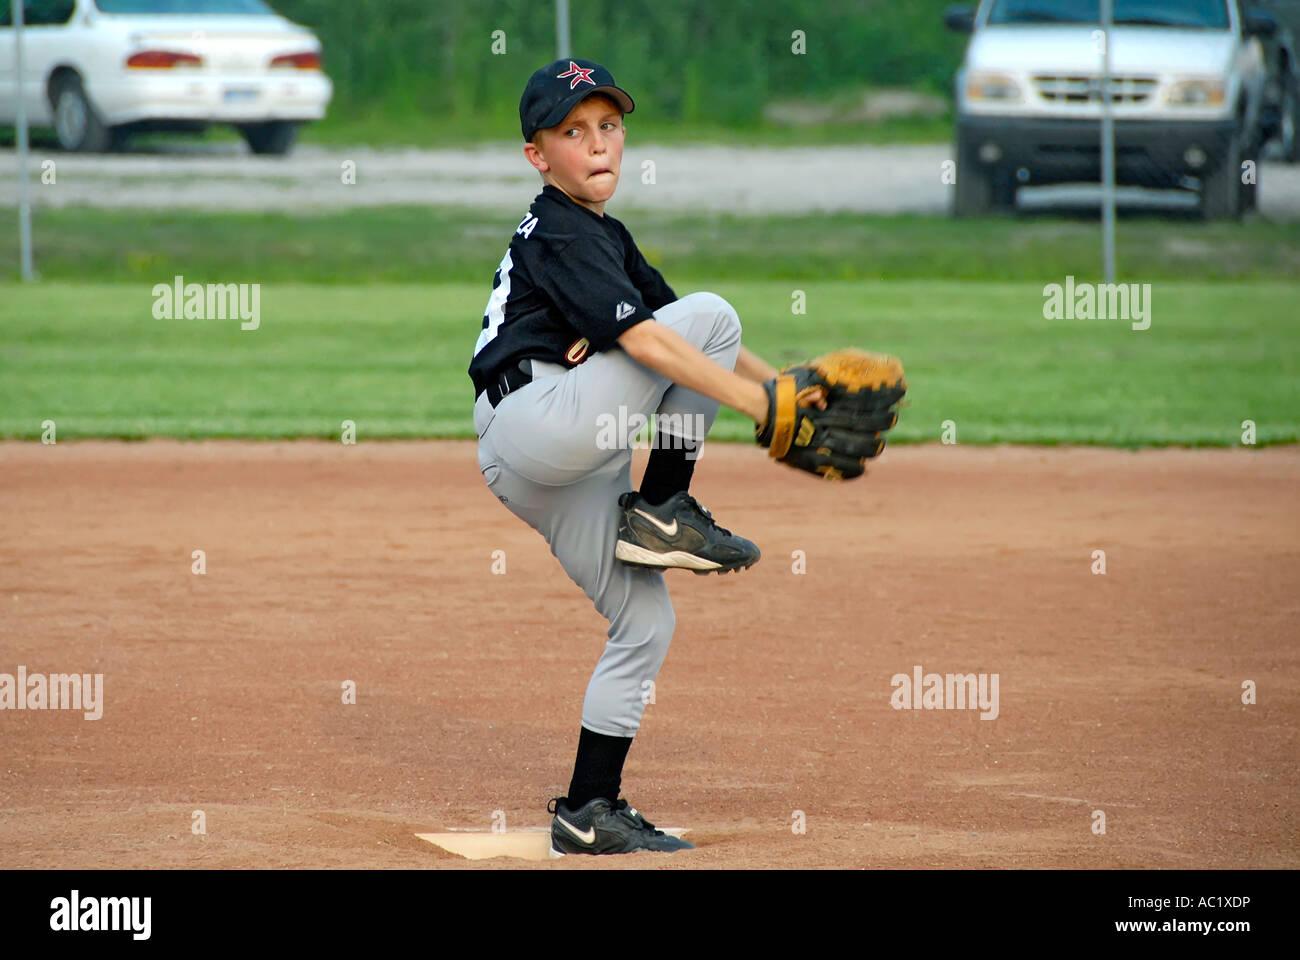 Little League baseball pitcher player throwing a baseball - Stock Image